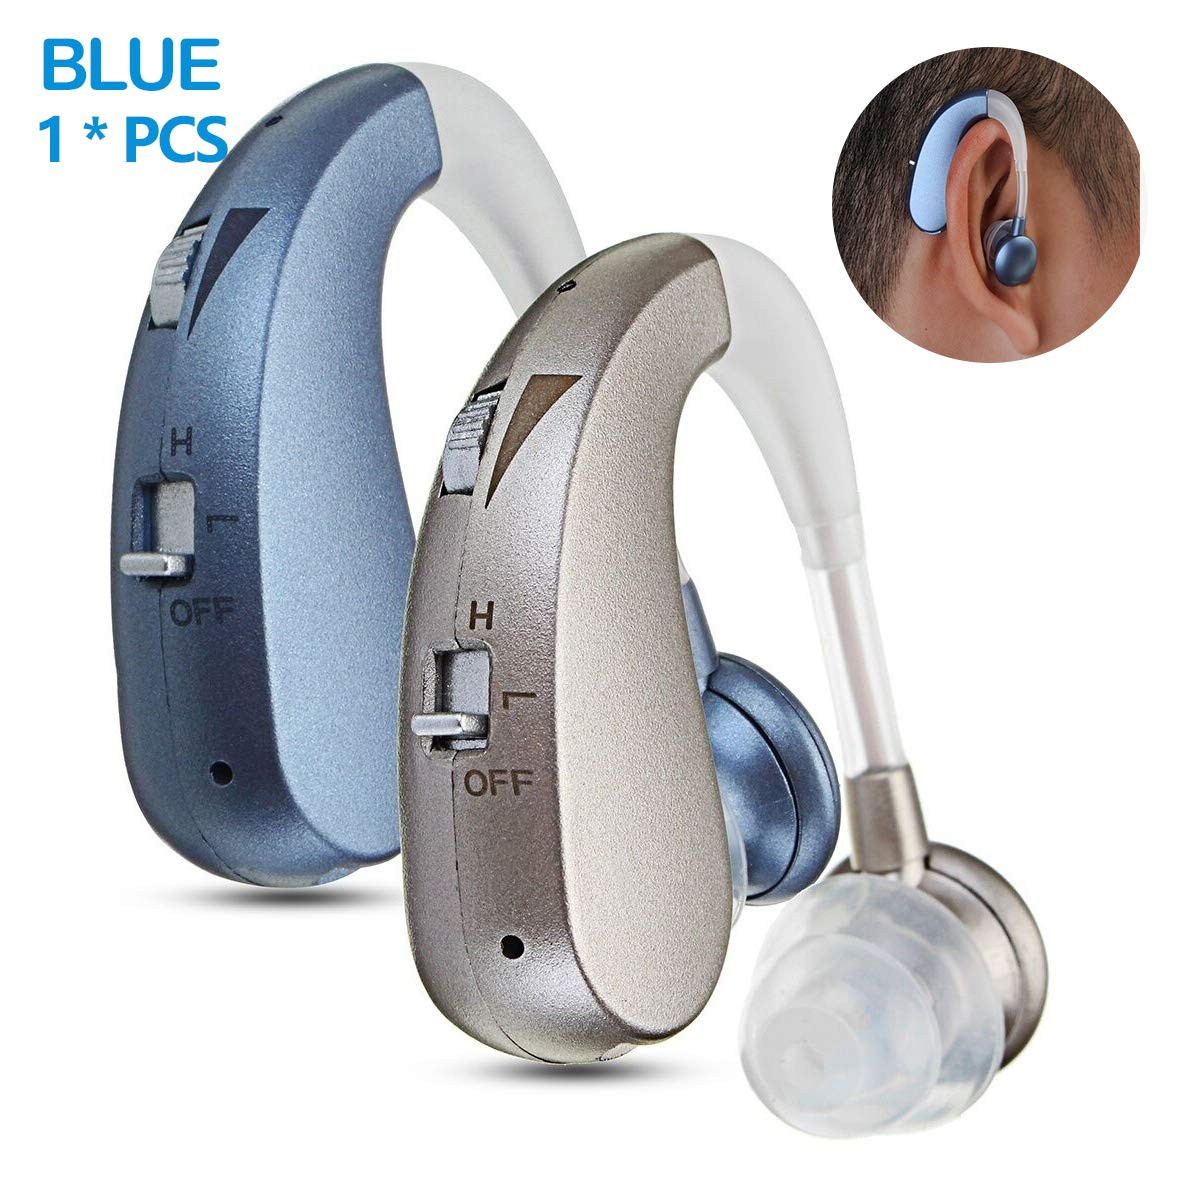 LAIWEN Digital Premium Hearing Amplifier Volume Controlable Feedback Canceling Sound Amplifier for Men Women PSAP by LAIWEN (Image #1)